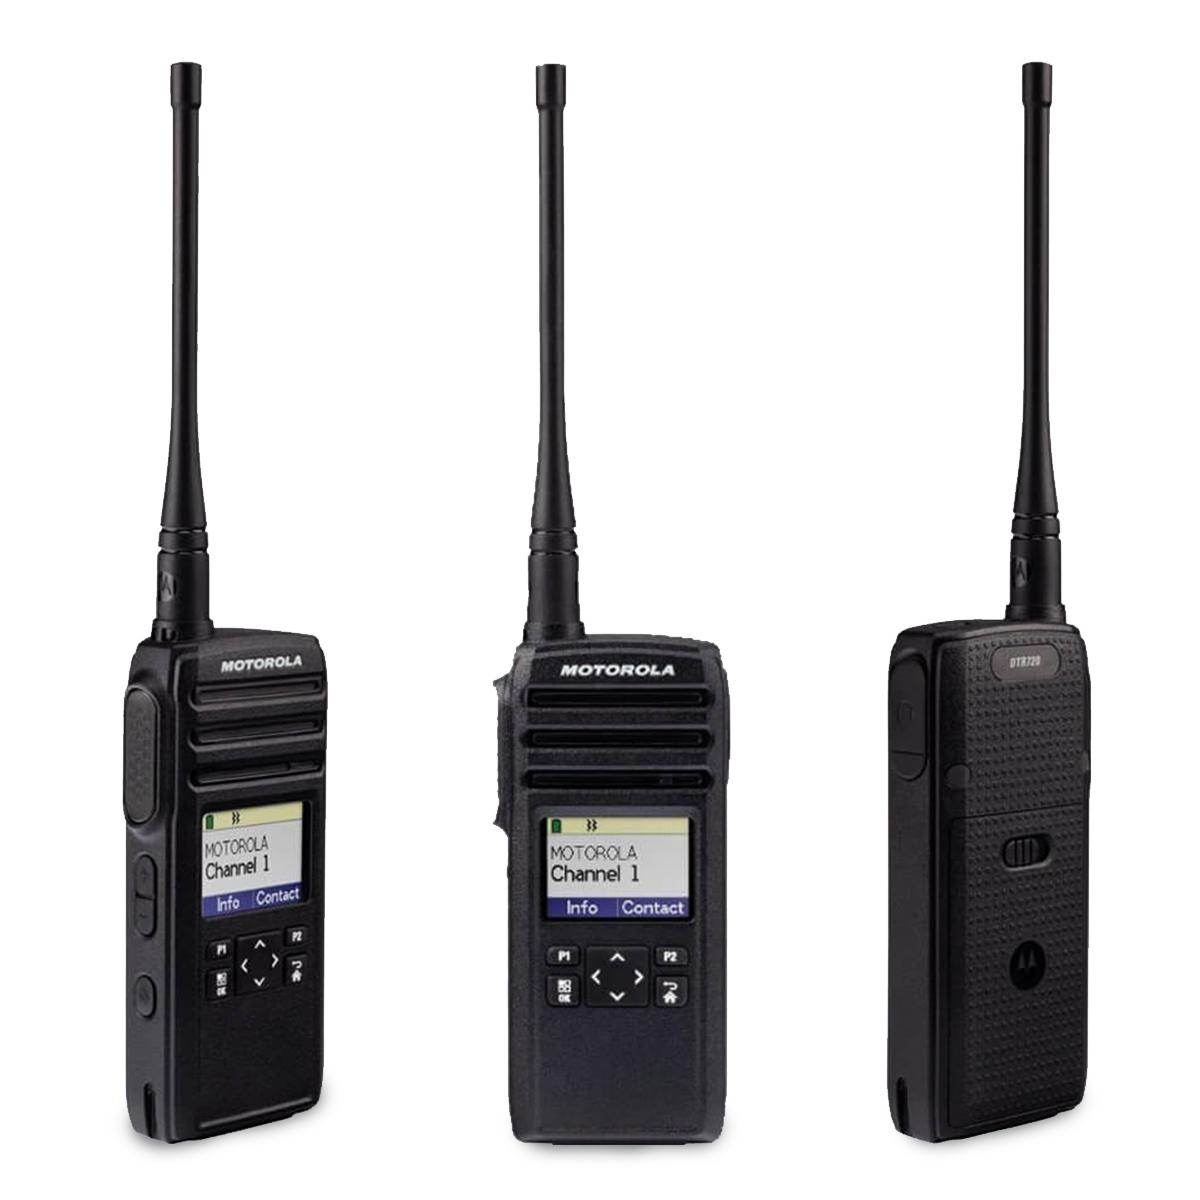 Radio Motorola DTR720 Digital